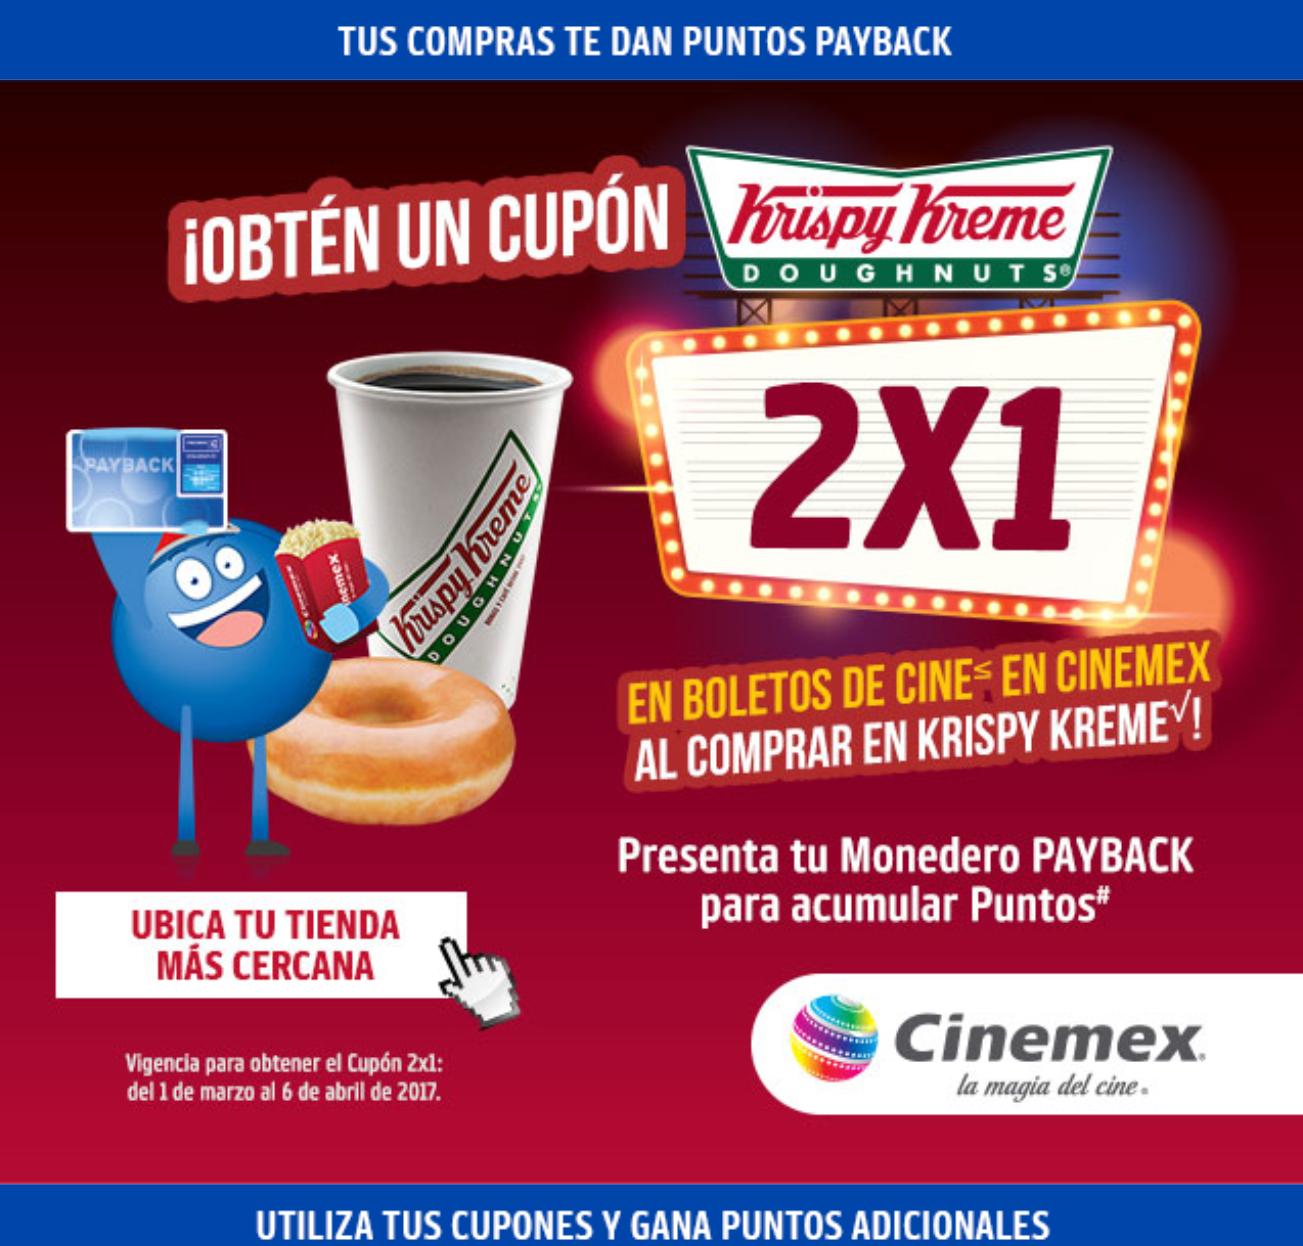 Cinemex: Cupón 2x1 al comprar en Krispy Kreme